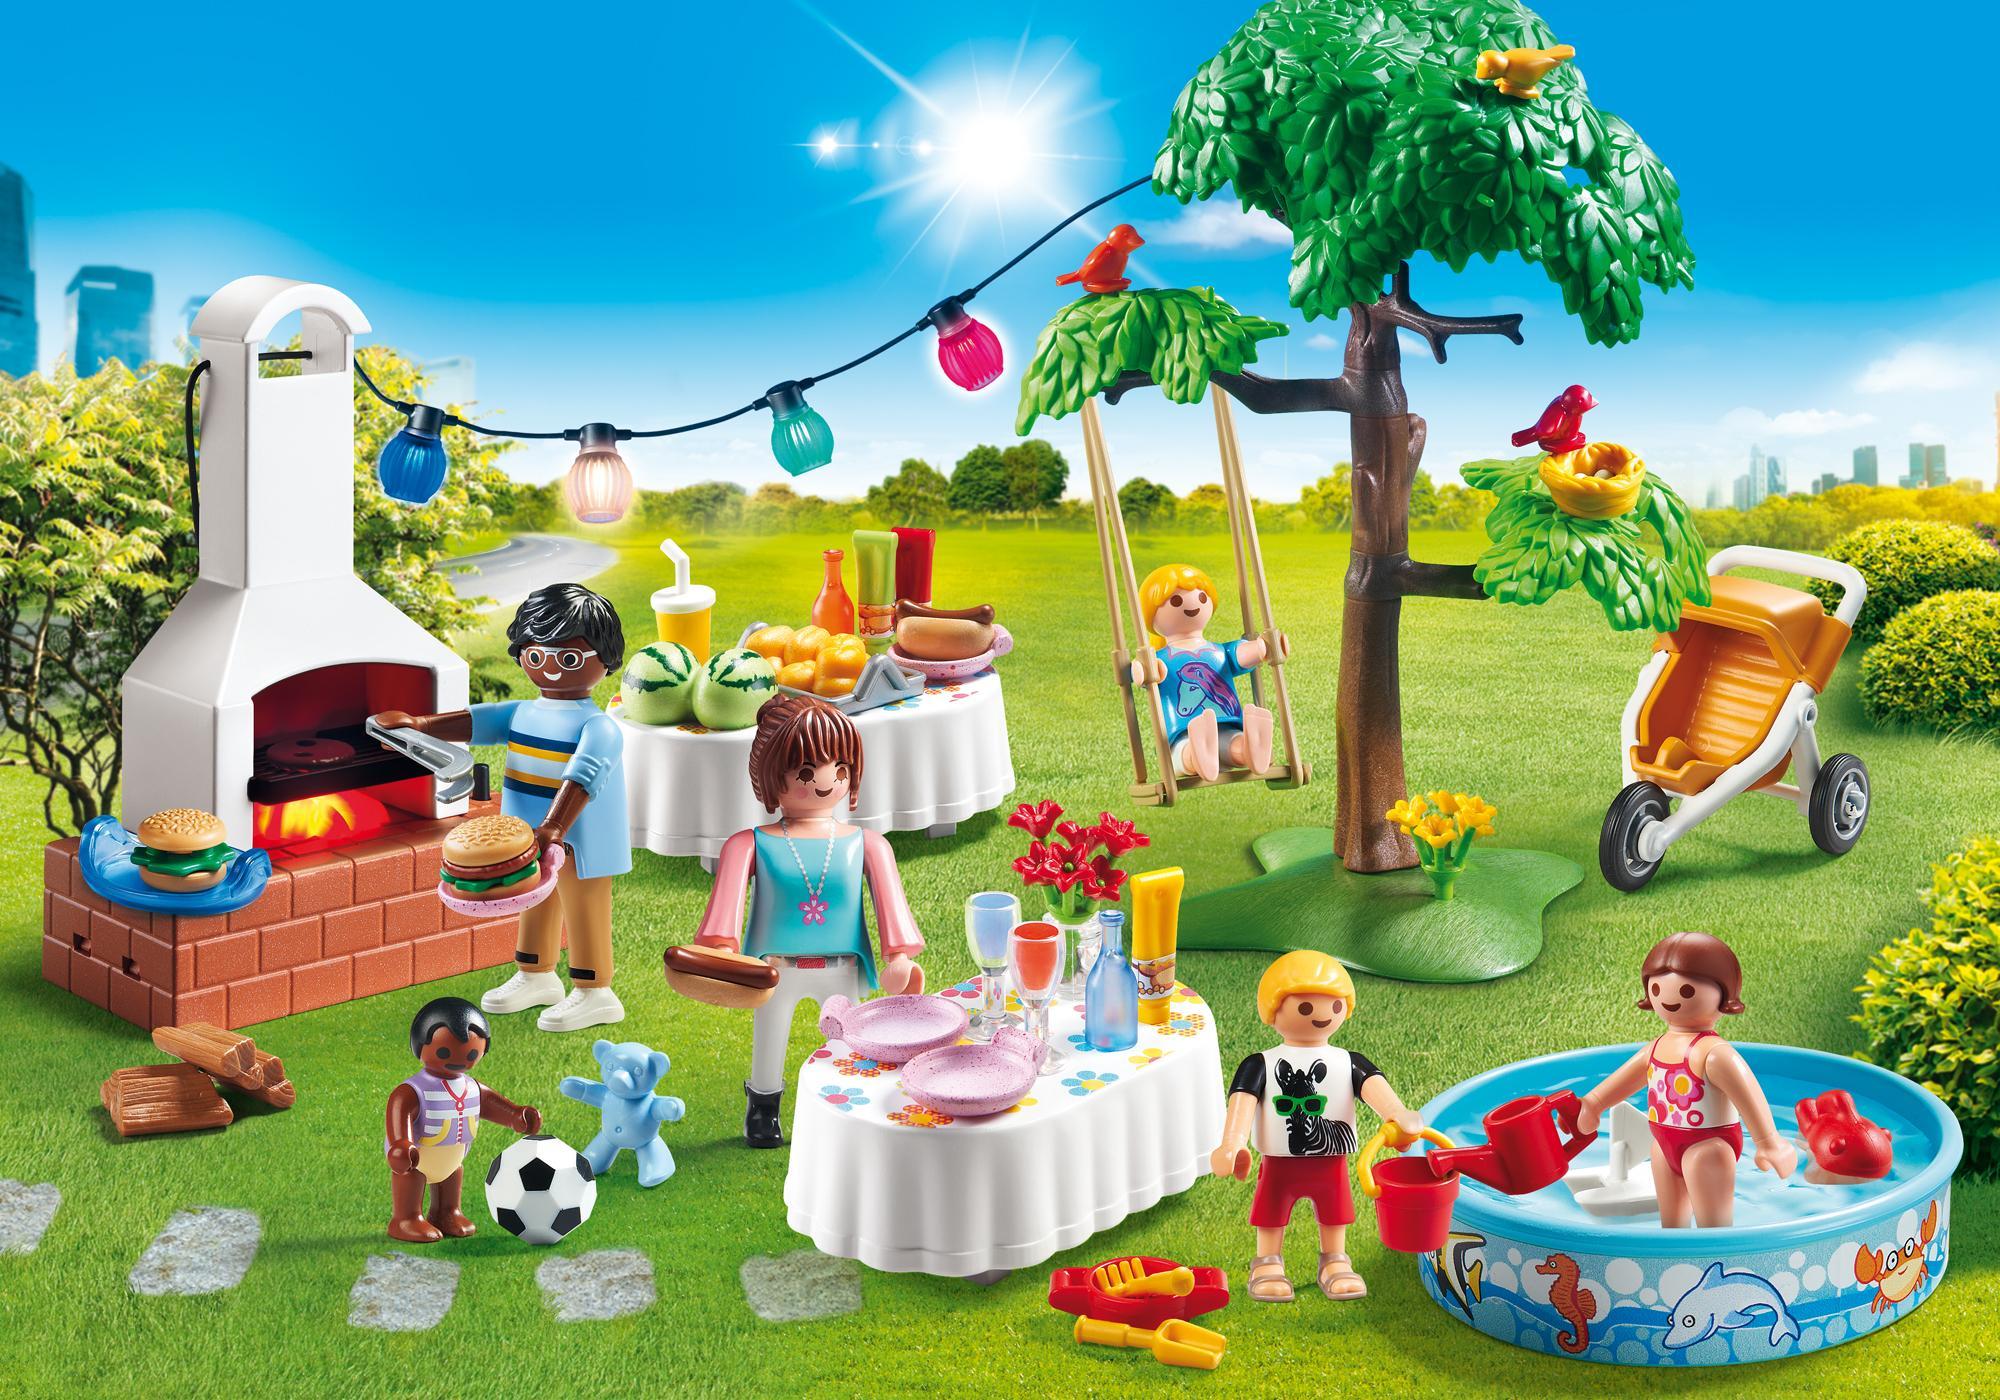 http://media.playmobil.com/i/playmobil/9272_product_detail/Einweihungsparty